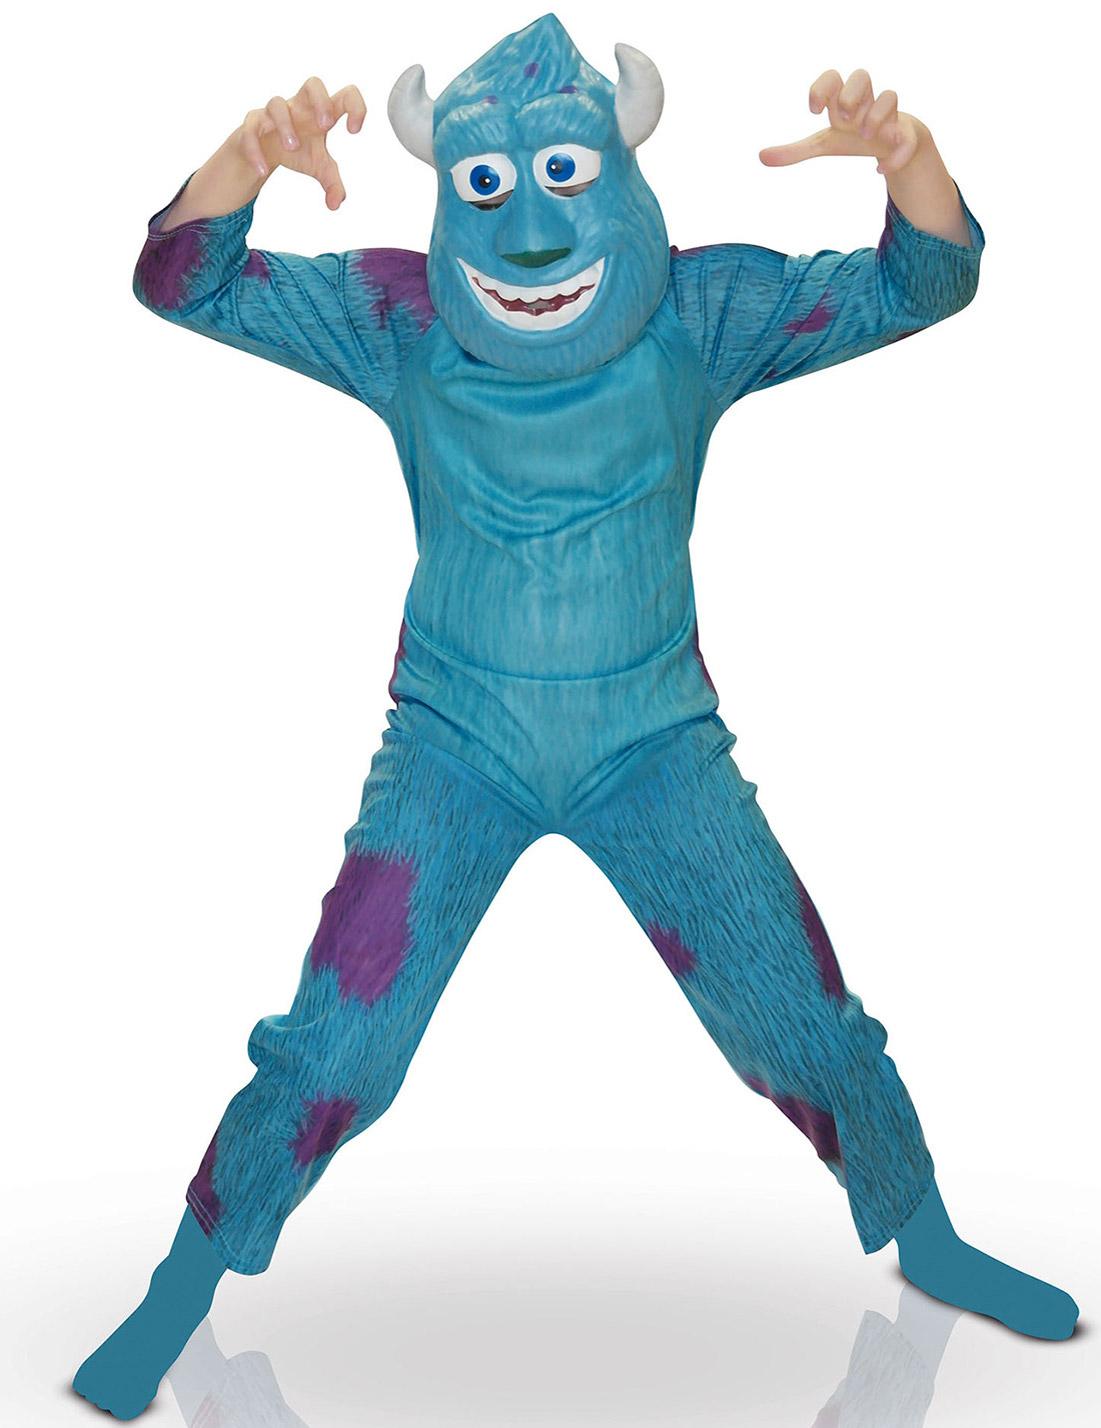 Monster Uni Kostum.Sully Kinderkostum Die Monster Uni Blau Gunstige Faschings Kostume Bei Karneval Megastore